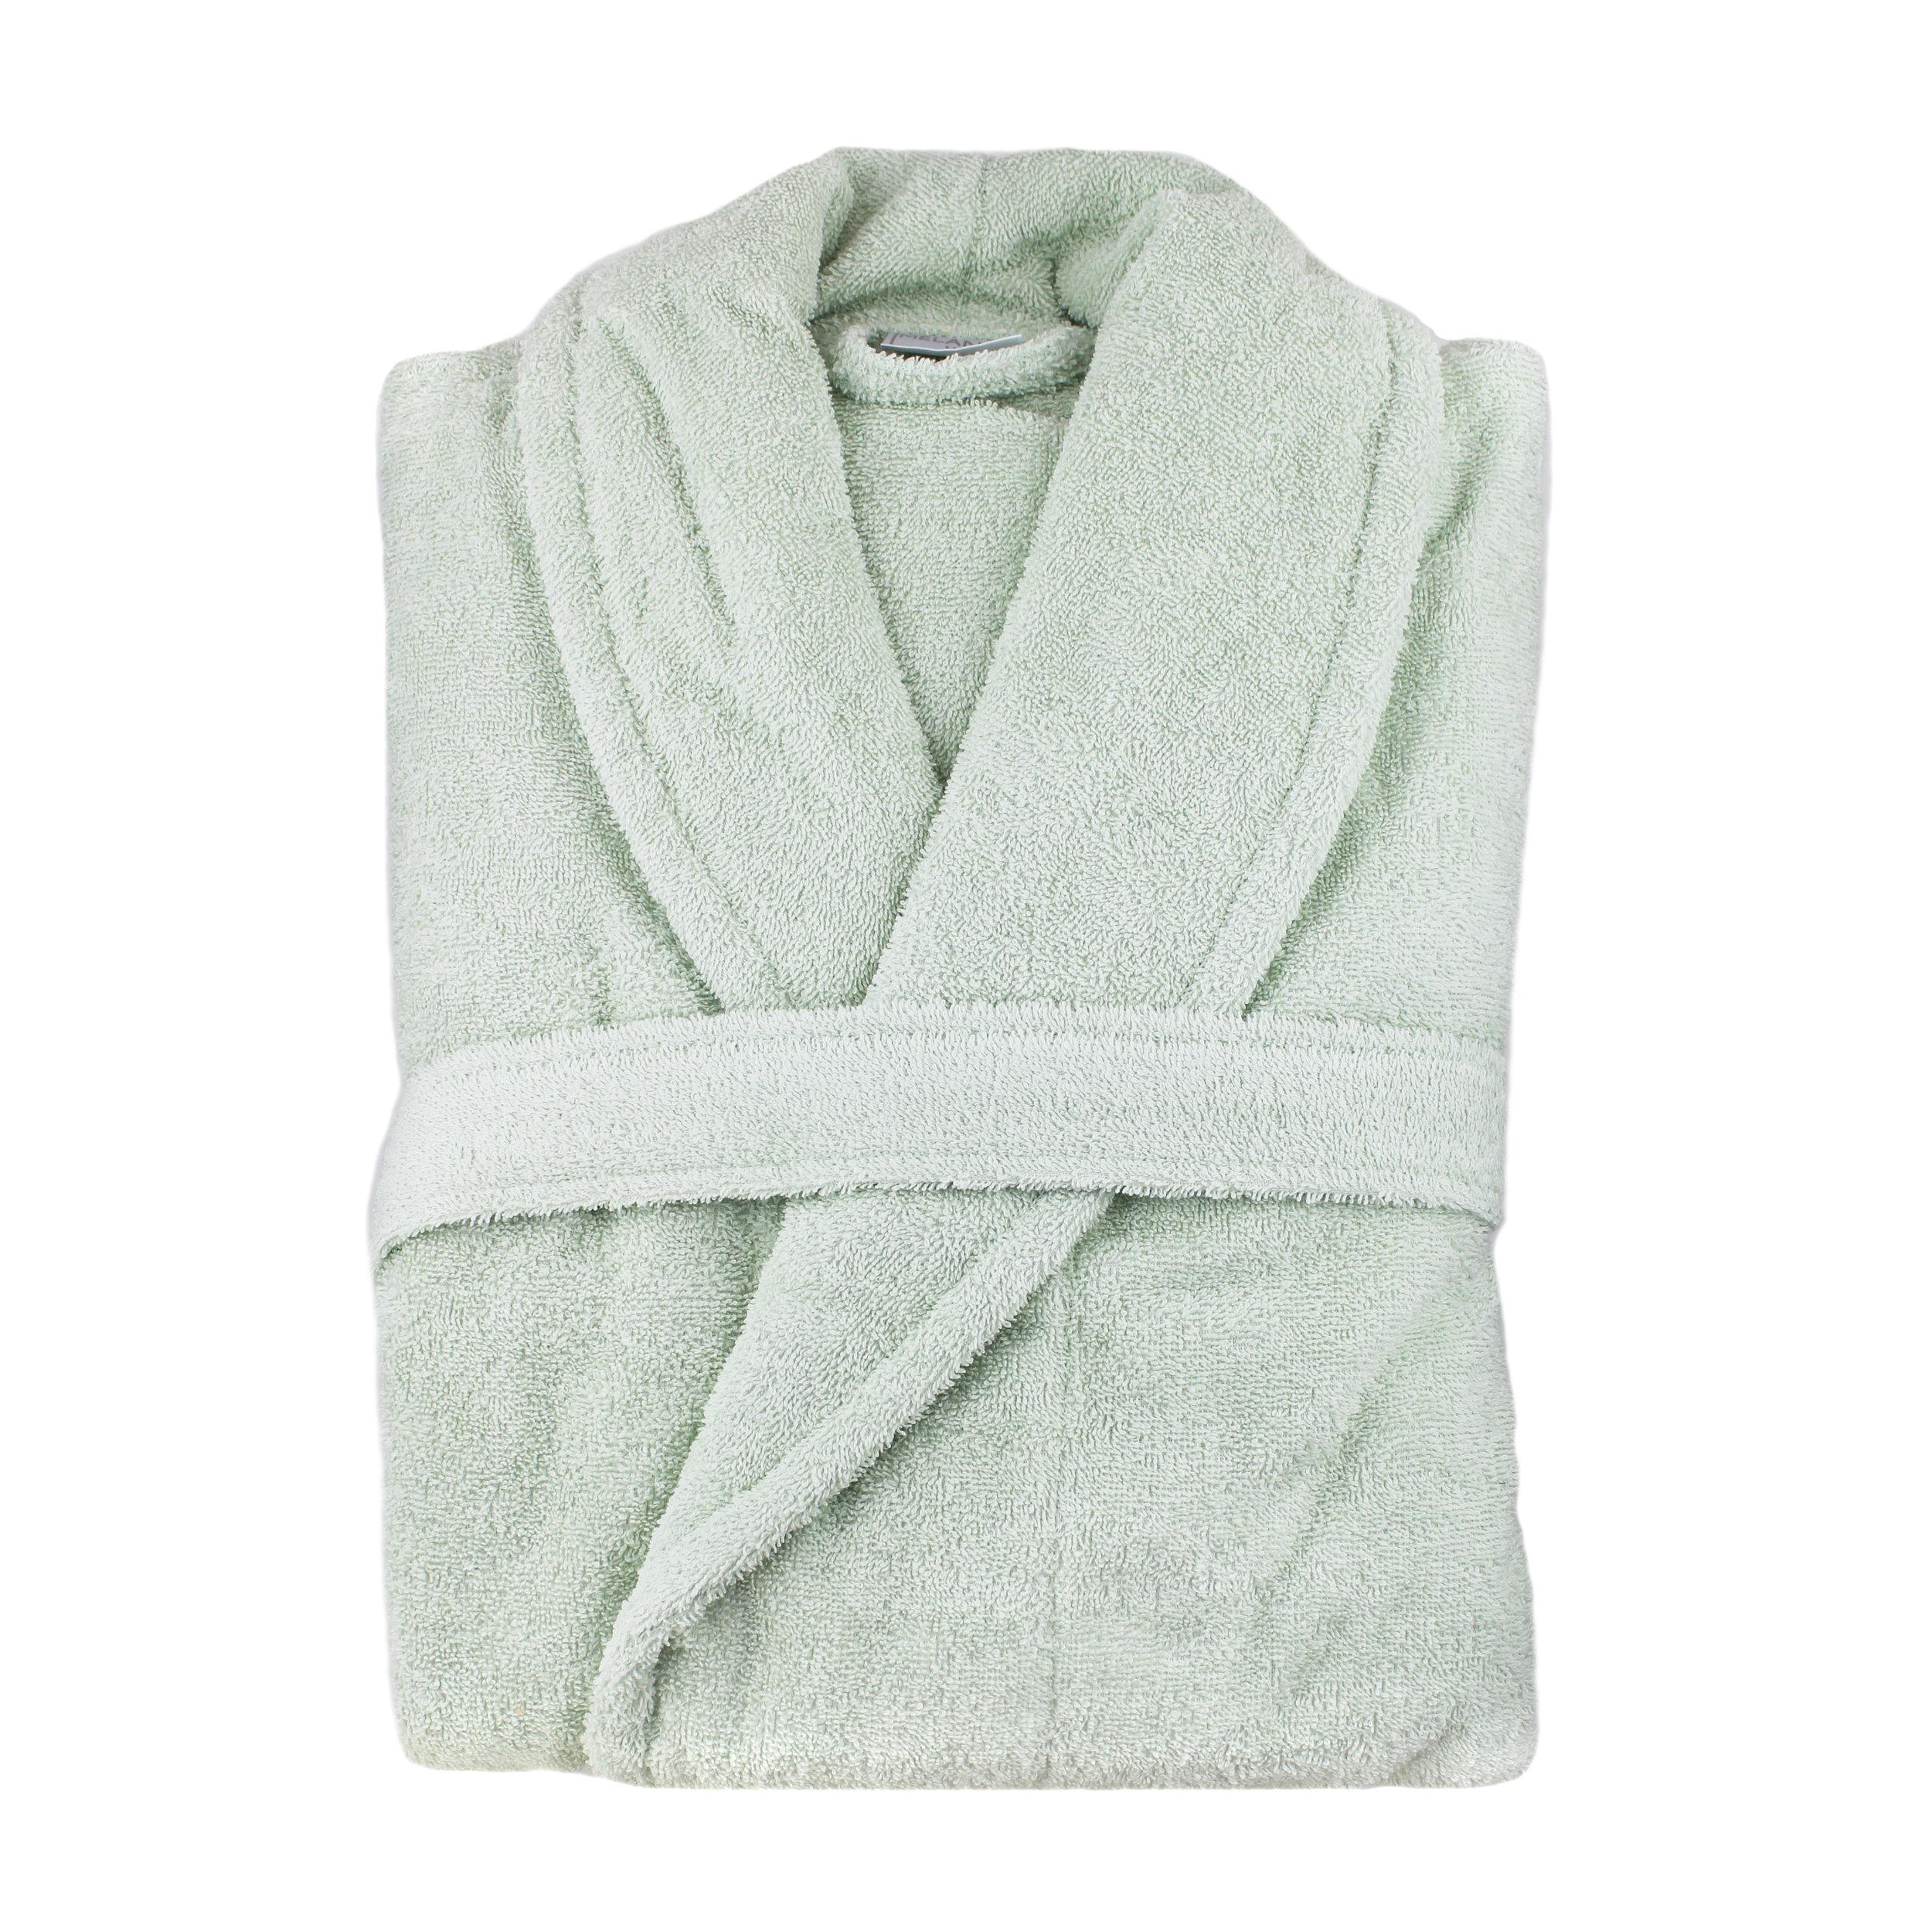 193233 Turkish Bath Robe_Sea Green.jpg